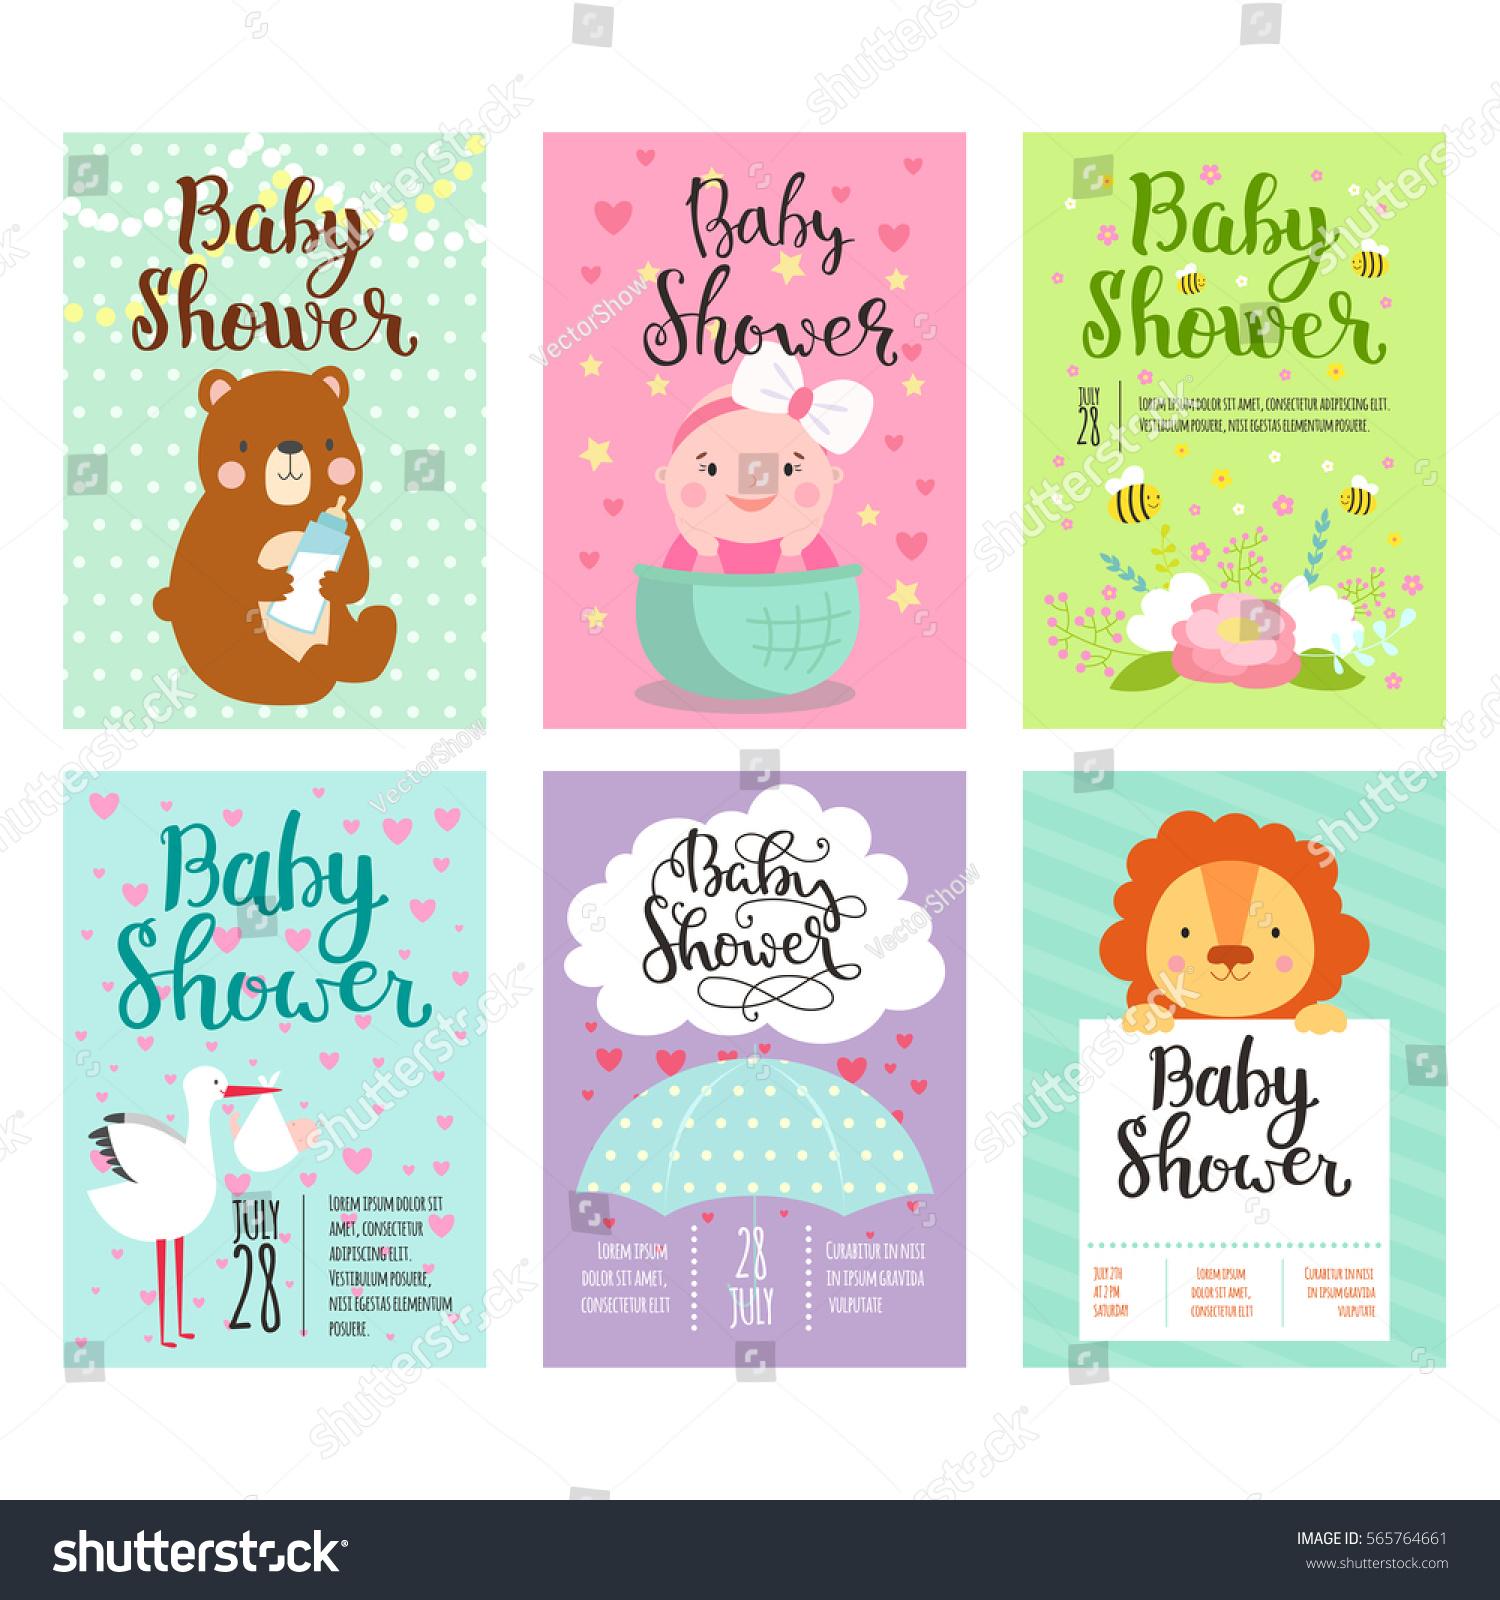 Baby shower invitation vector card kids stock vector 565764661 baby shower invitation vector card kids party new born celebration baby invitation cute adorable stopboris Choice Image